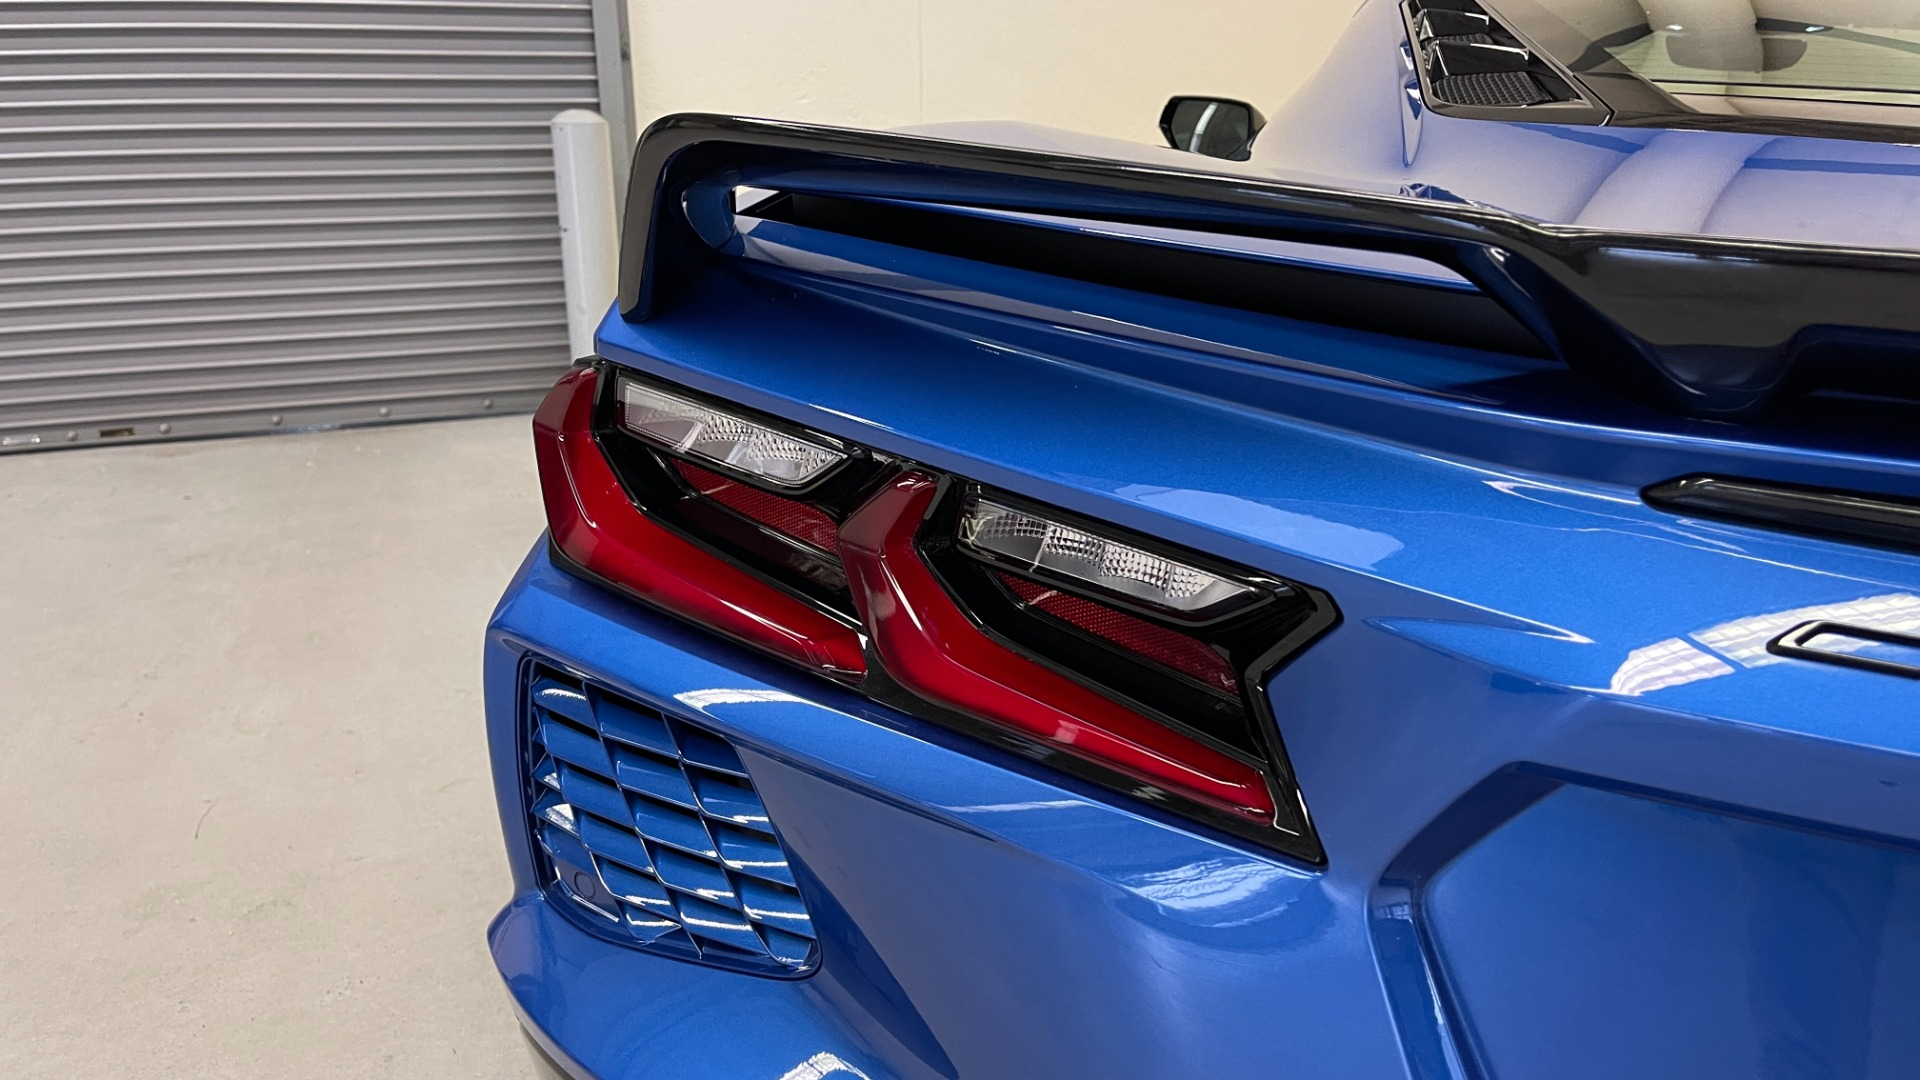 Used 2021 Chevrolet CORVETTE STINGRAY 3LT COUPE / 8-SPD / PERF PKG / NAV / BOSE / REARVIEW for sale $110,995 at Formula Imports in Charlotte NC 28227 10